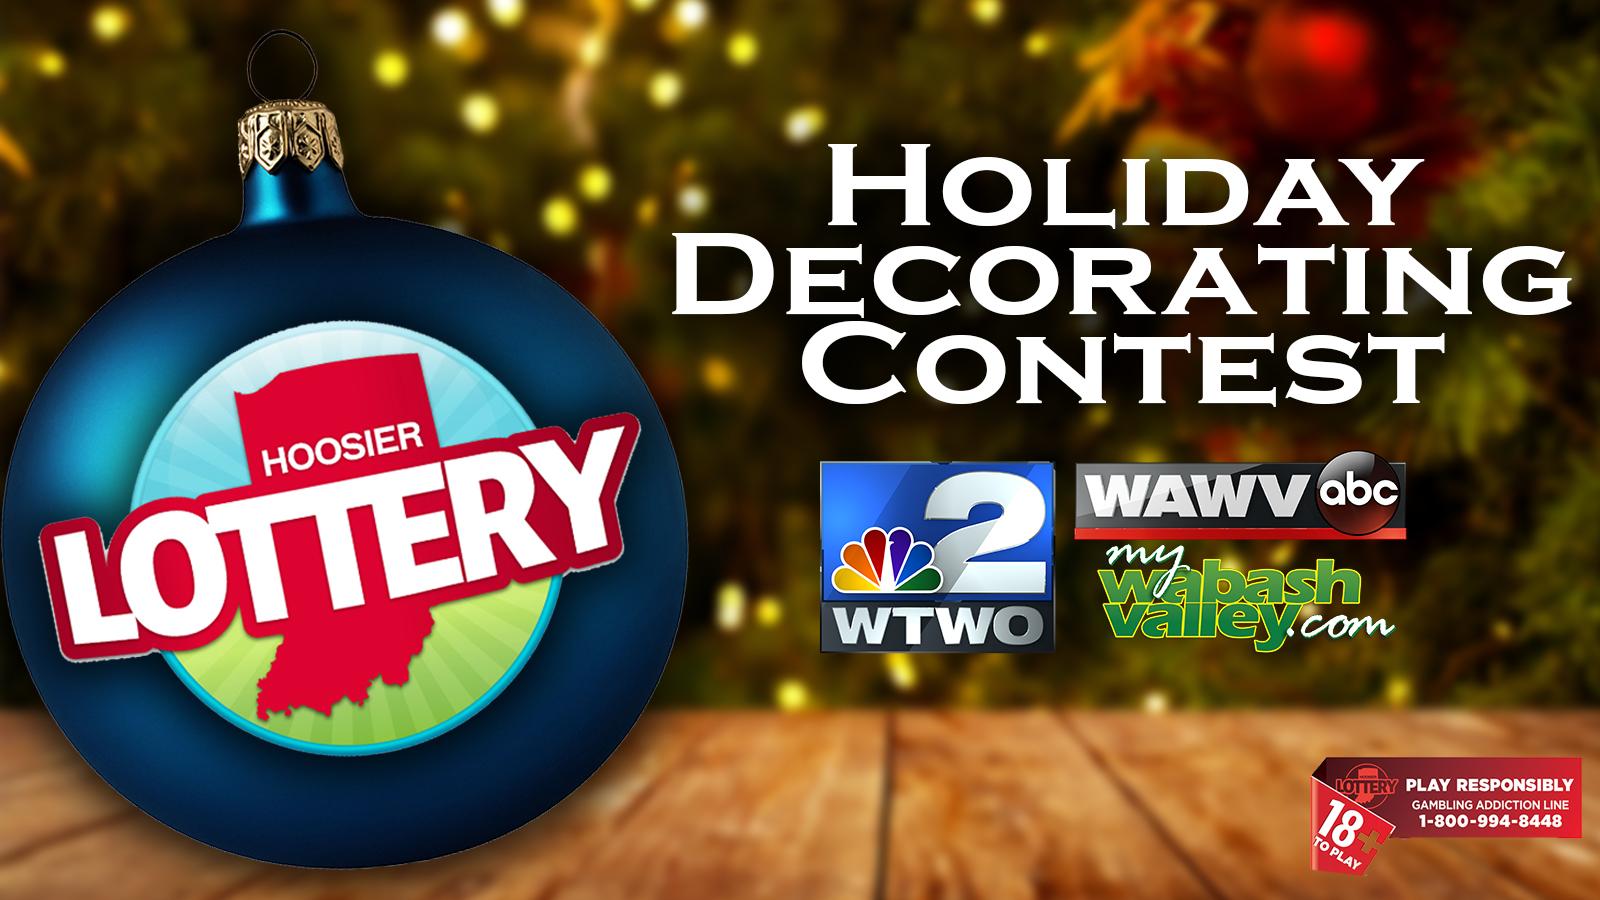 Holiday_Decorating_Contest_1510770142977.jpg